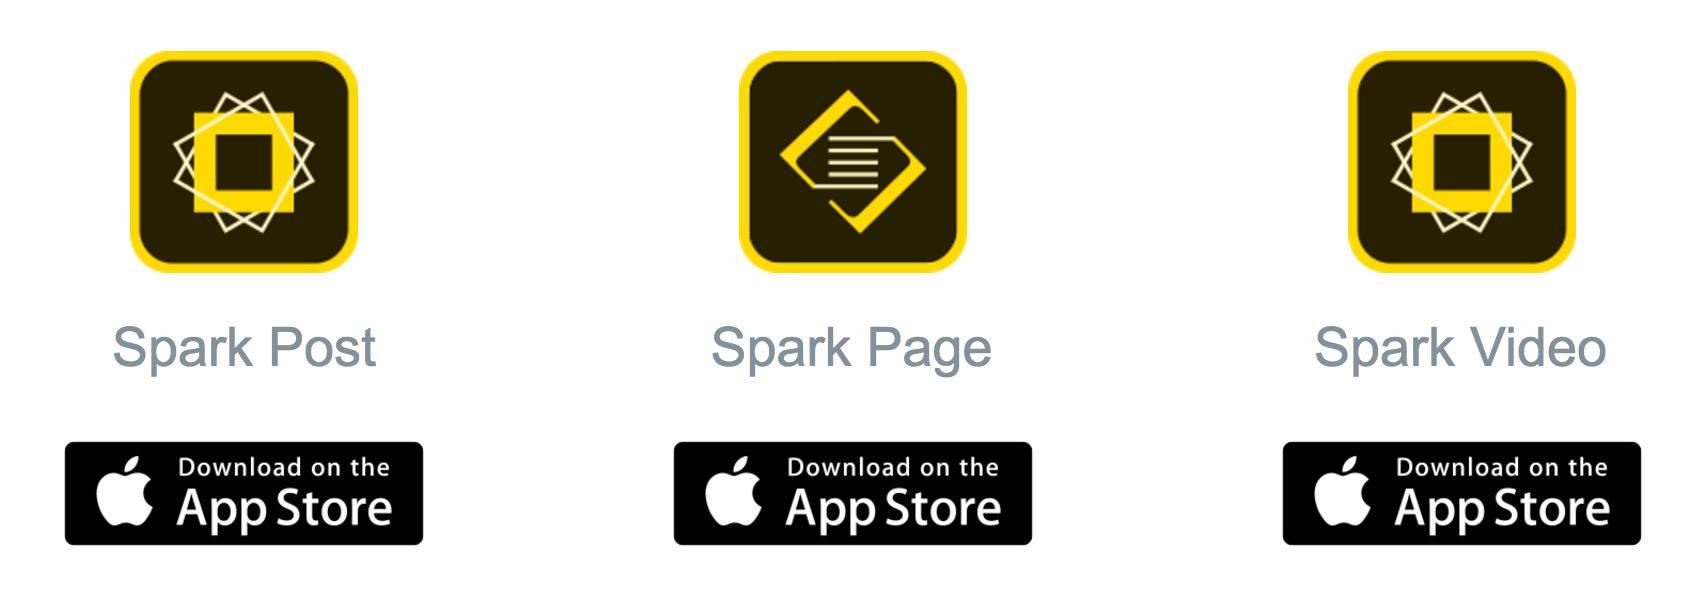 apps_spark